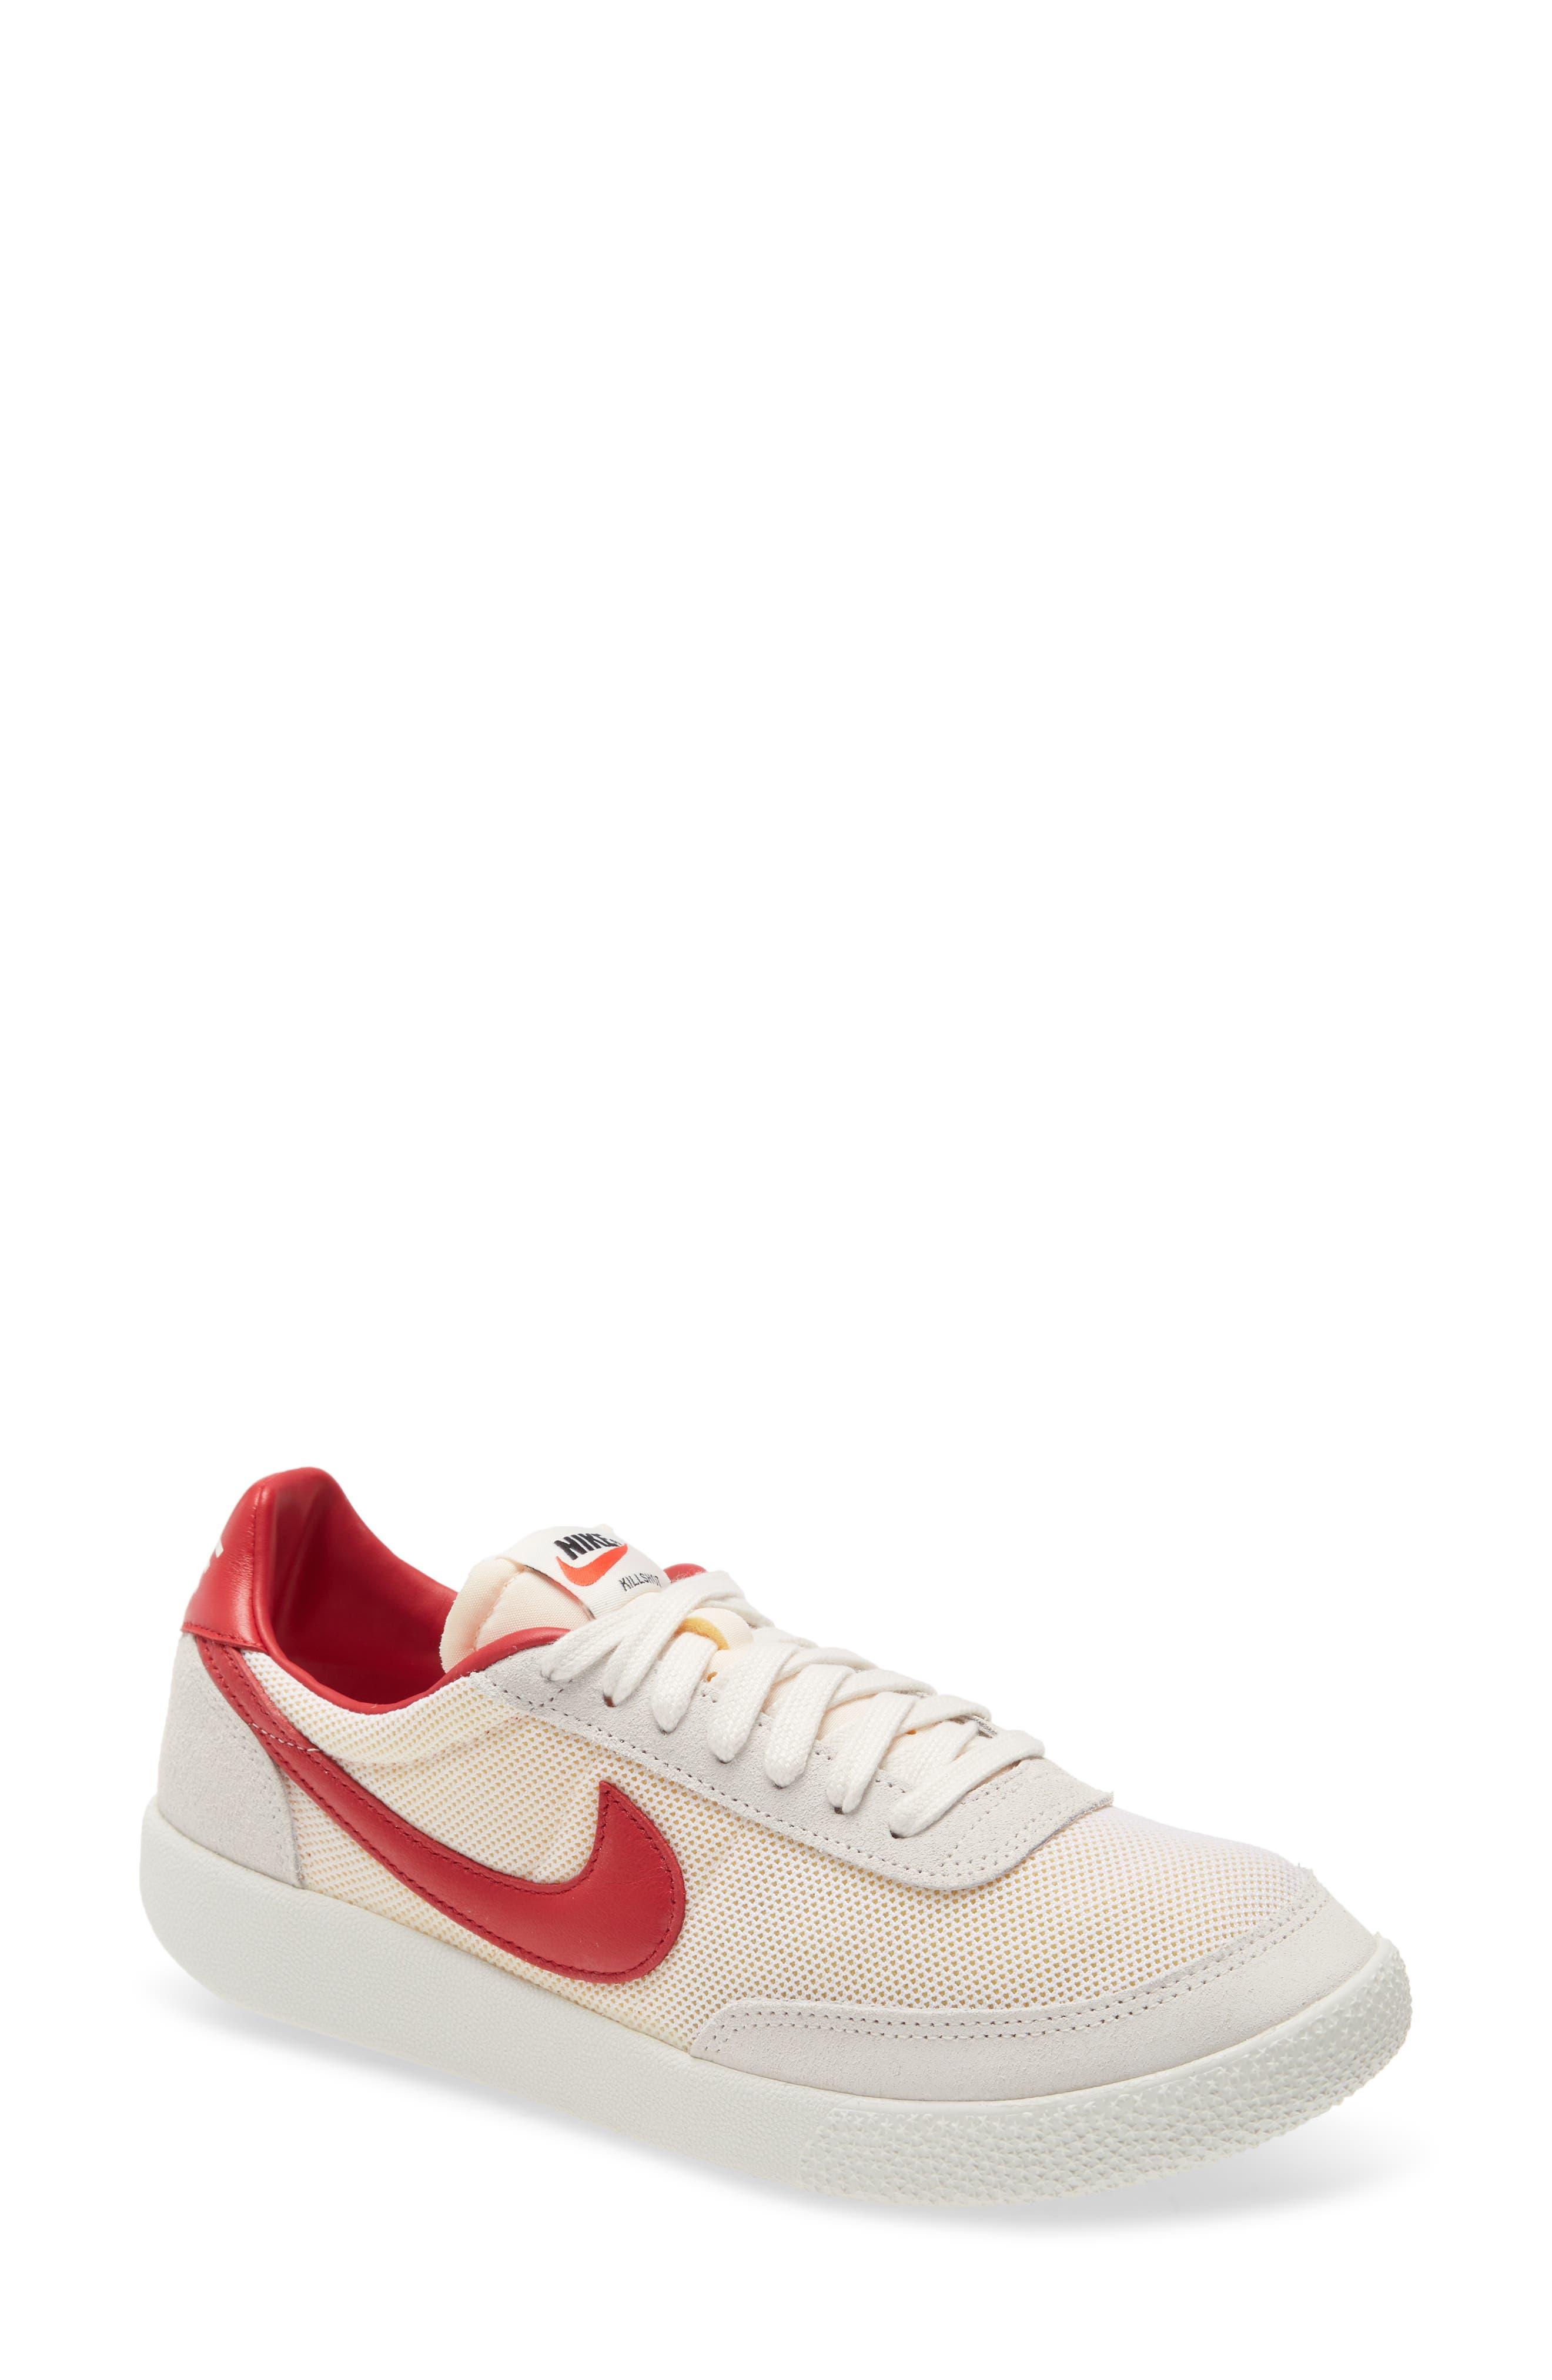 Men's Nike Sale & Clearance   Nordstrom